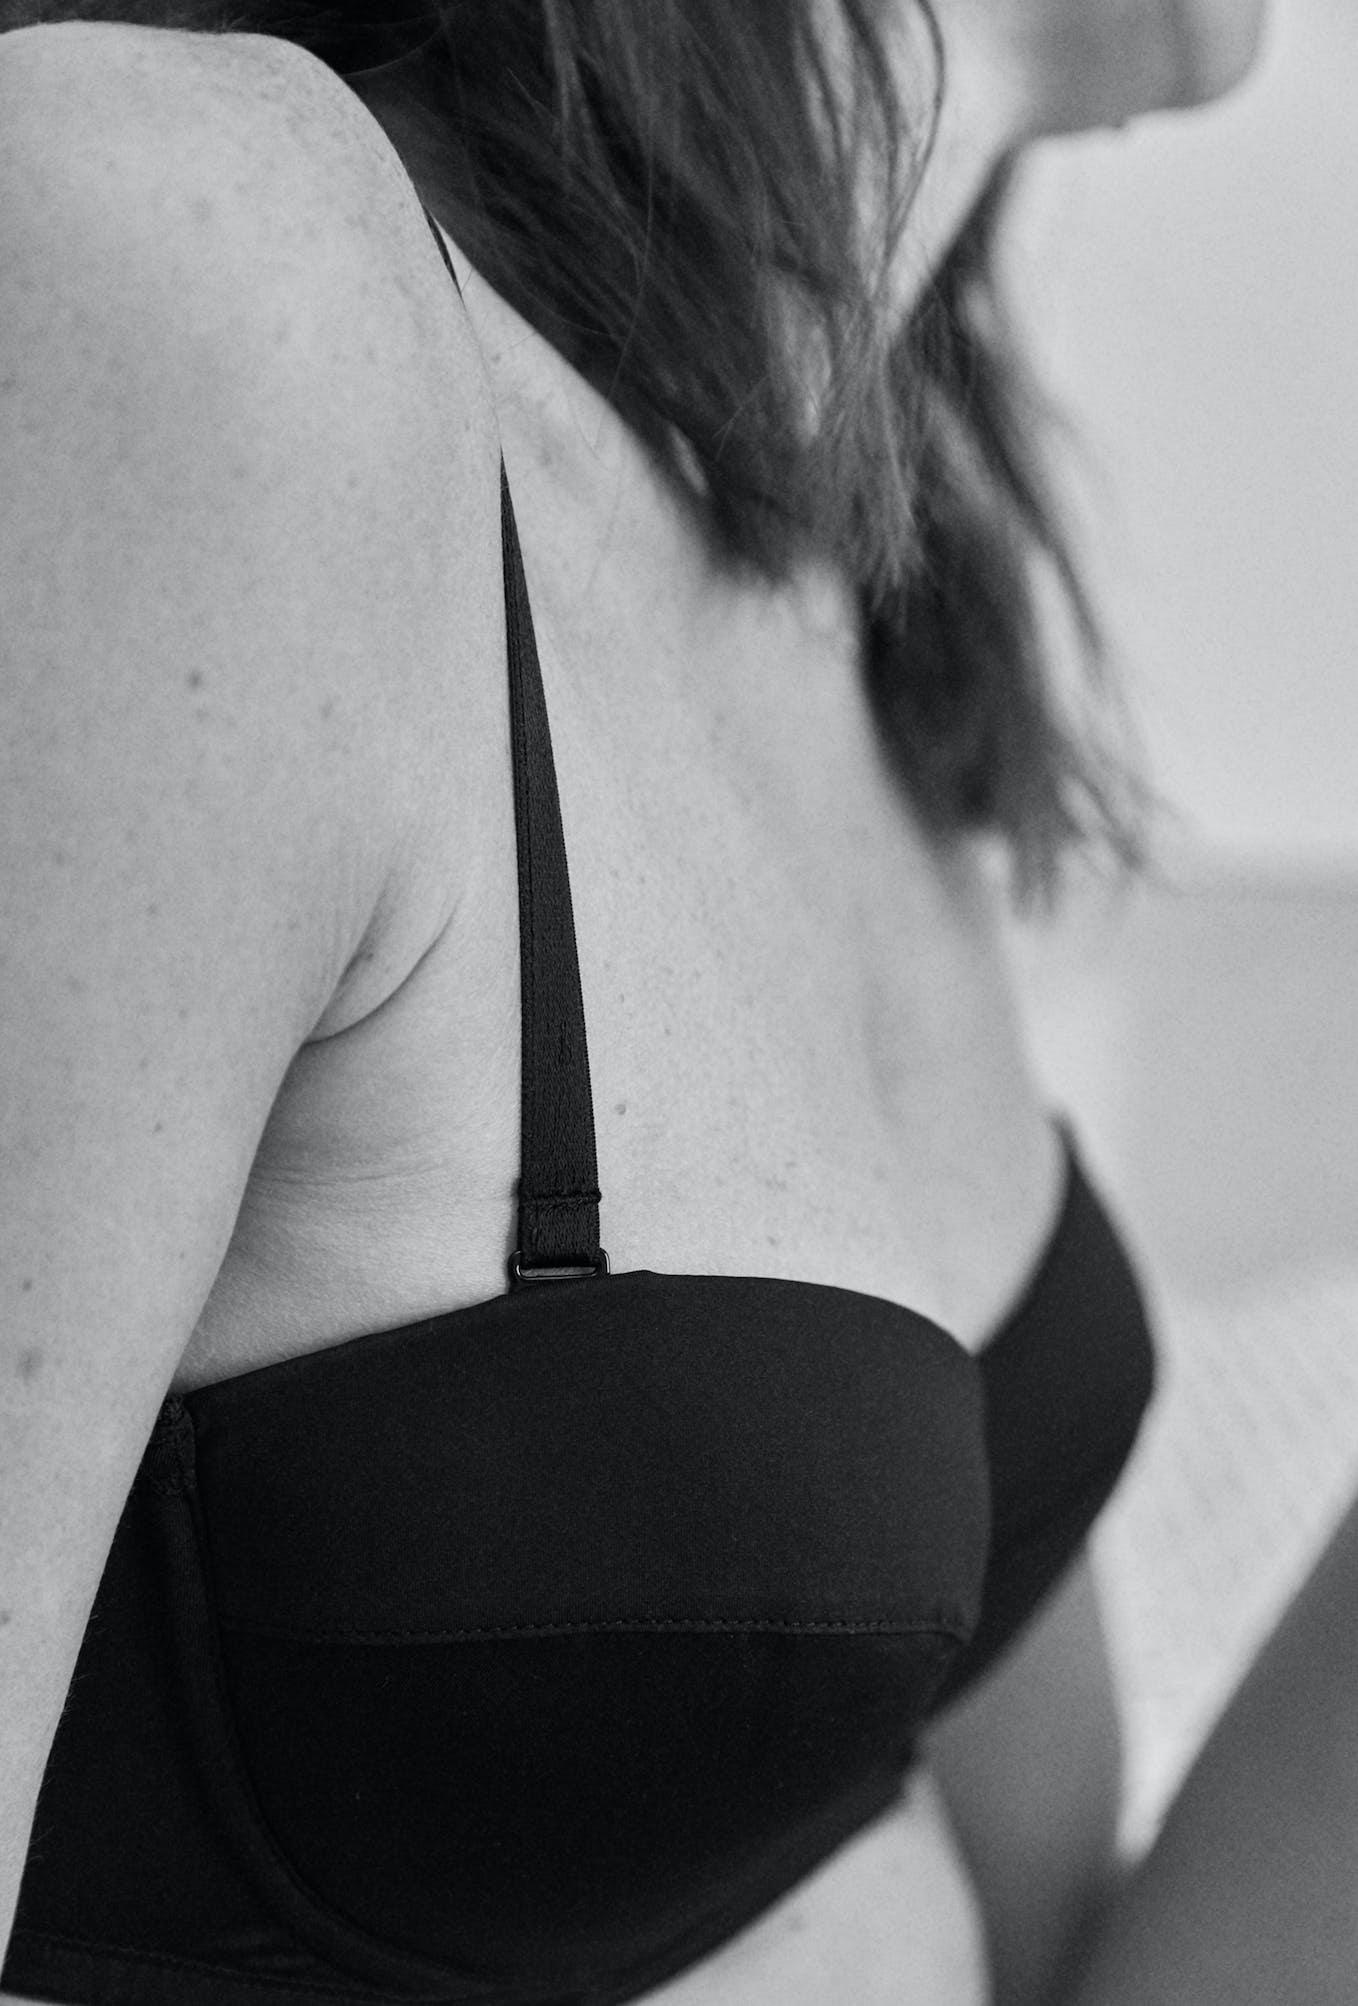 Bandeau bra Histoire de femmes in black